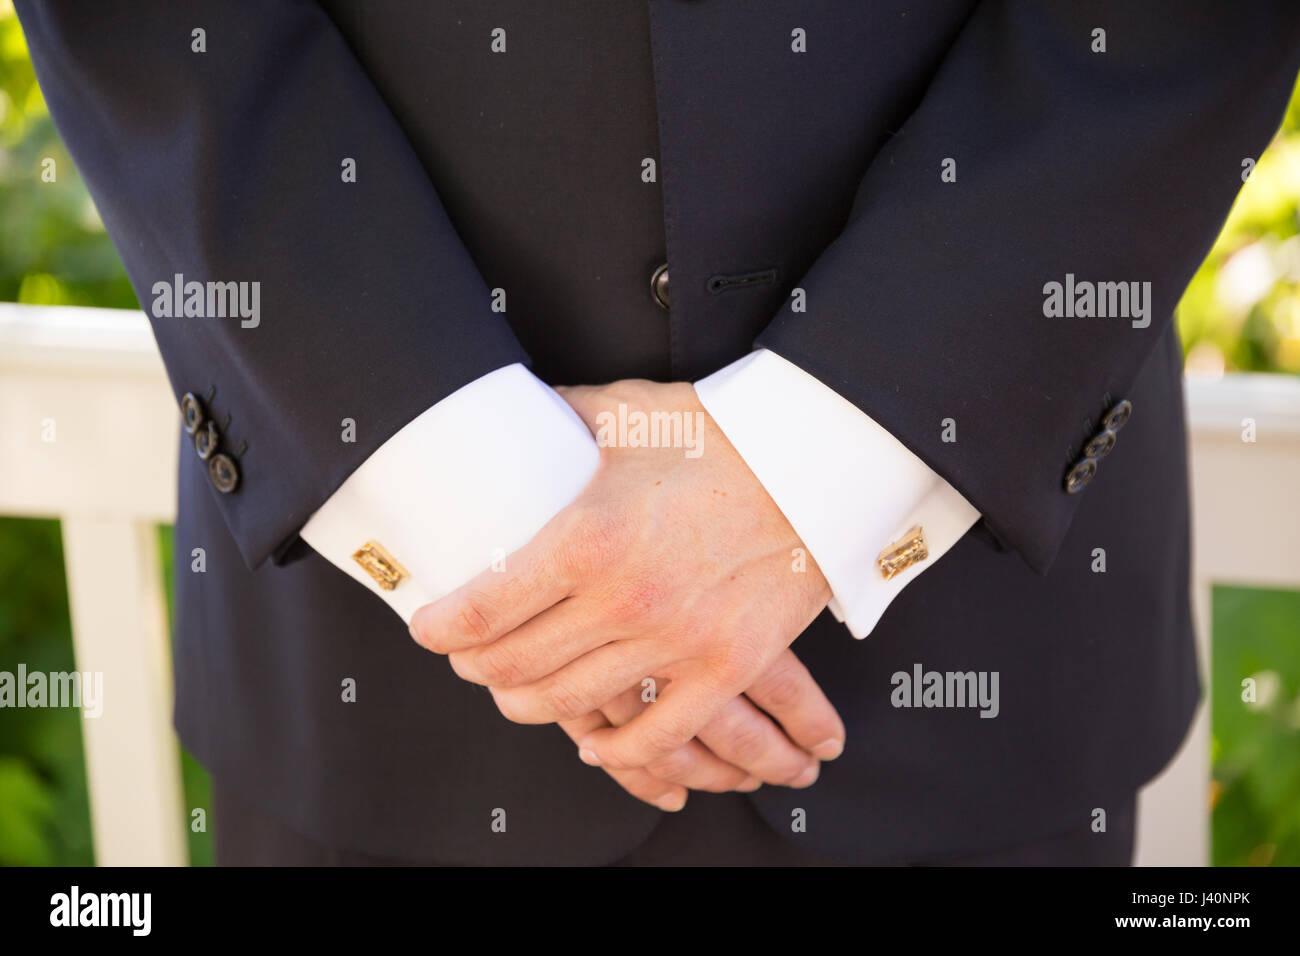 Groom Formal Attire on Wedding Day Stock Photo